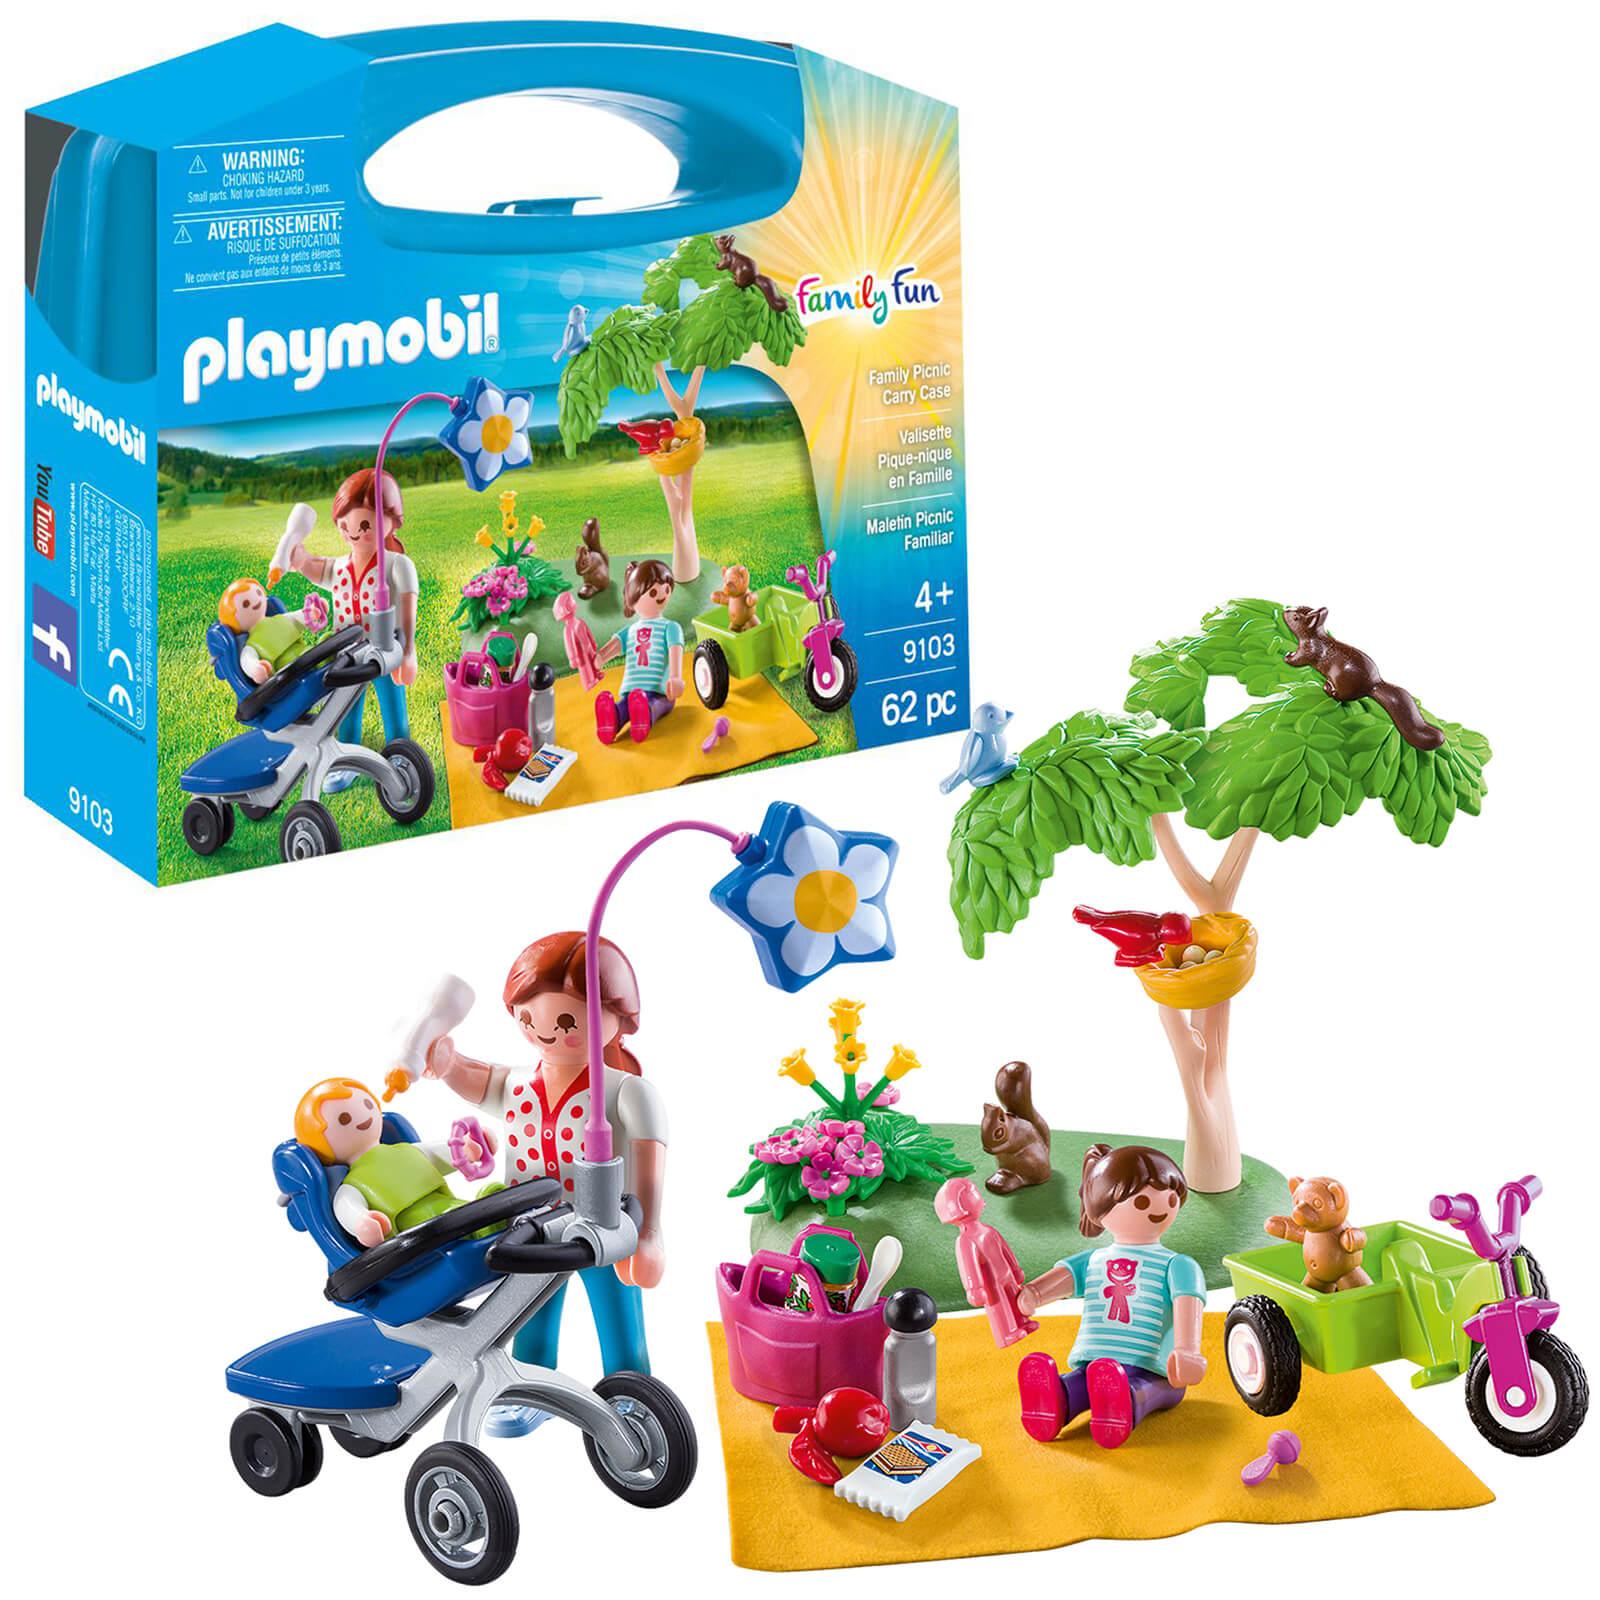 Playmobil Family Fun Family Picnic Carry Case (9103)